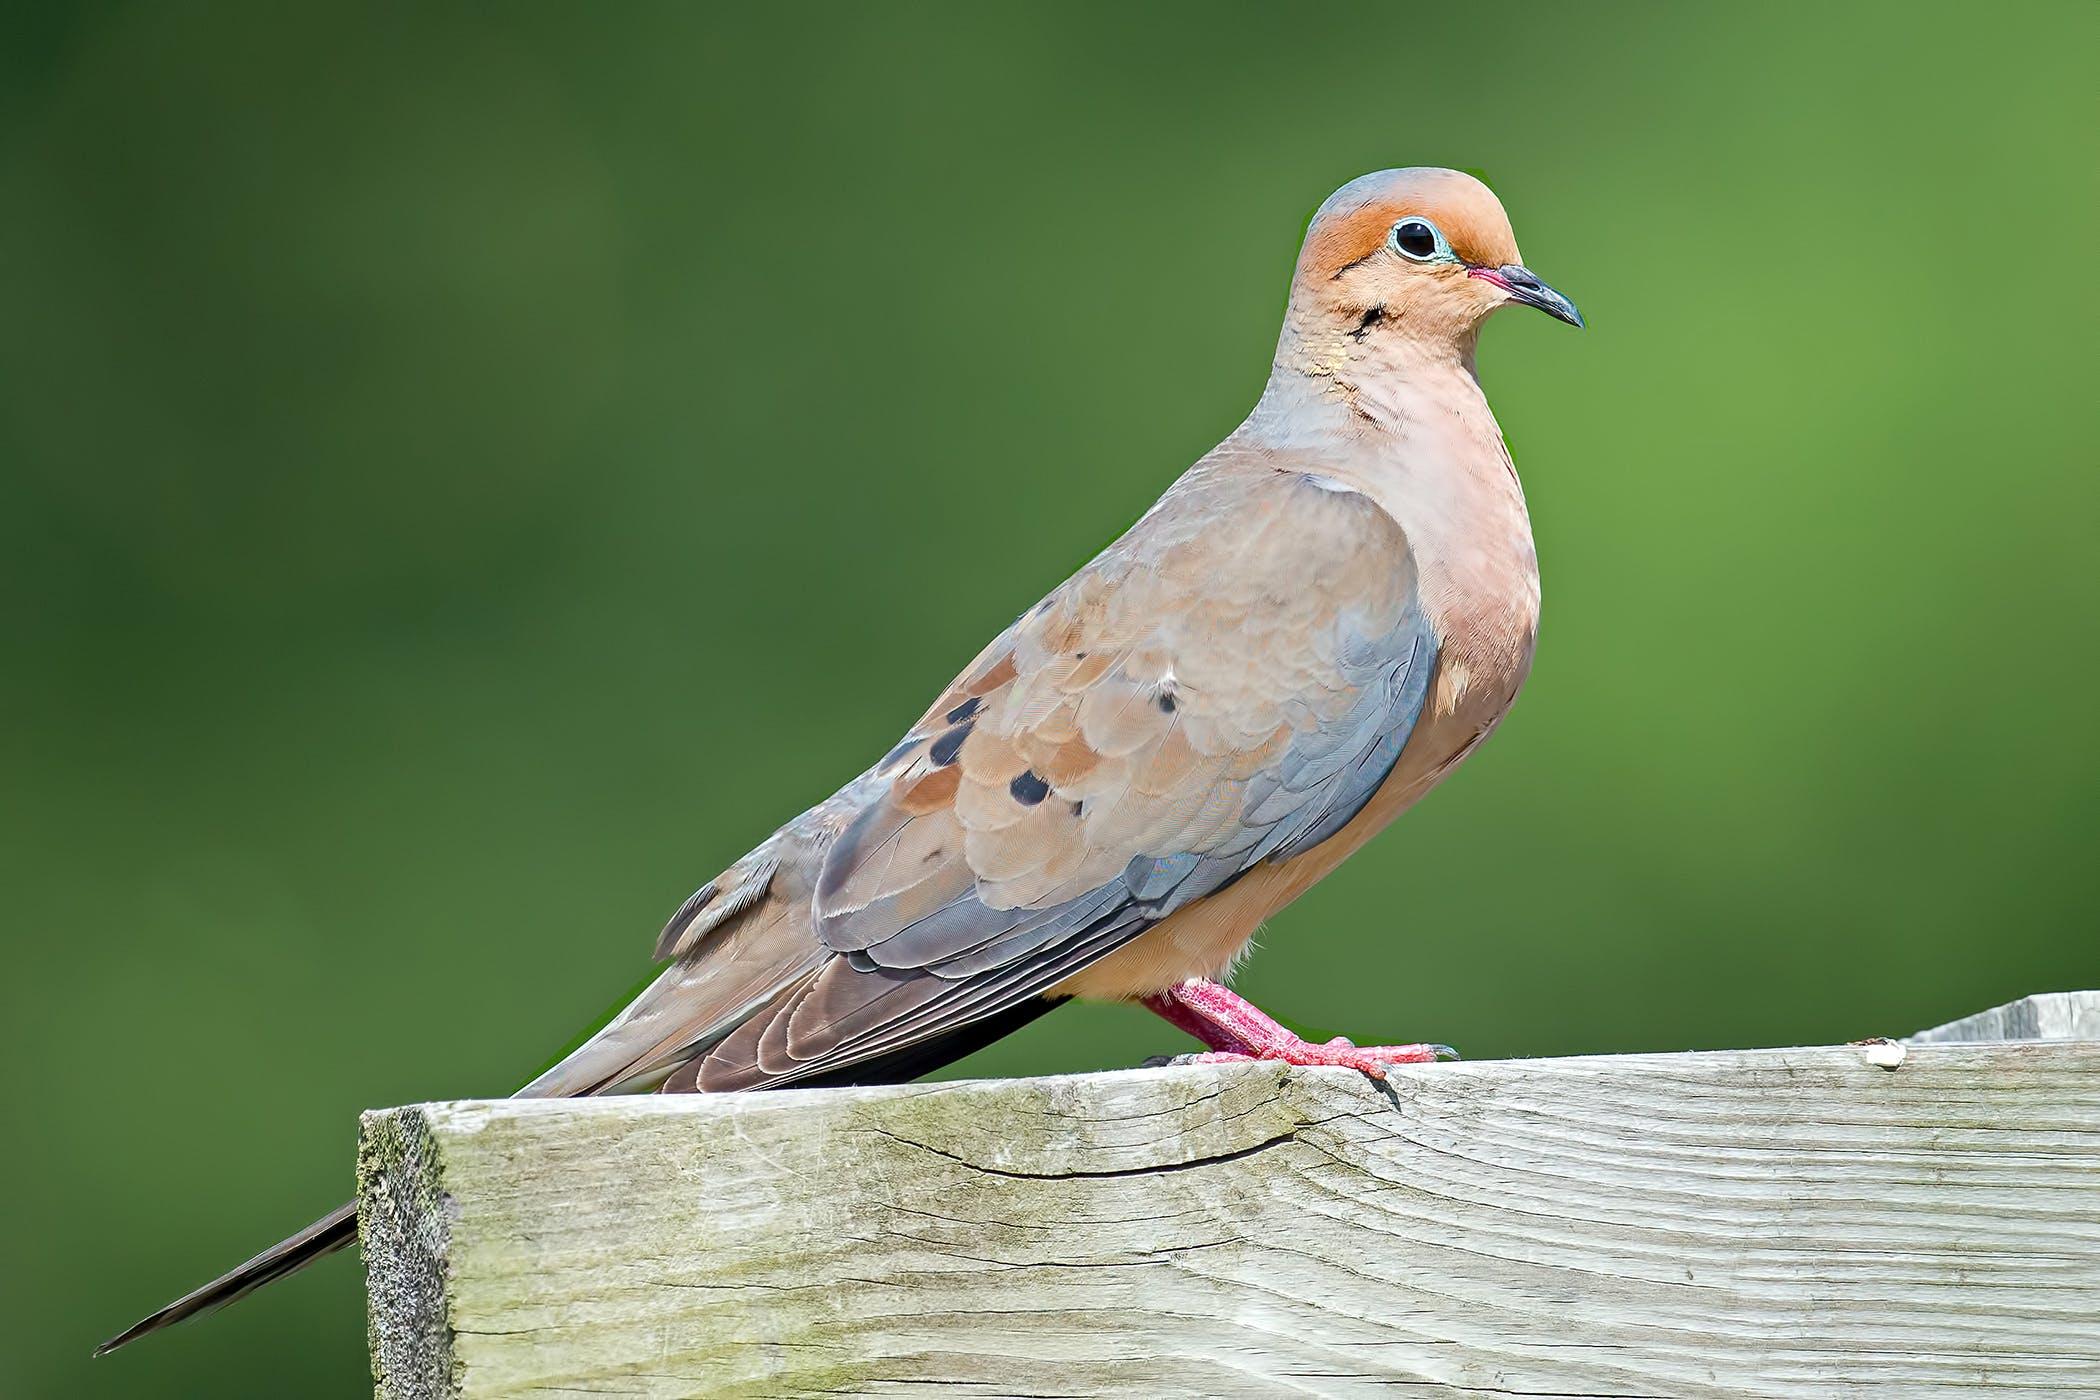 Chlamydiosis in Birds